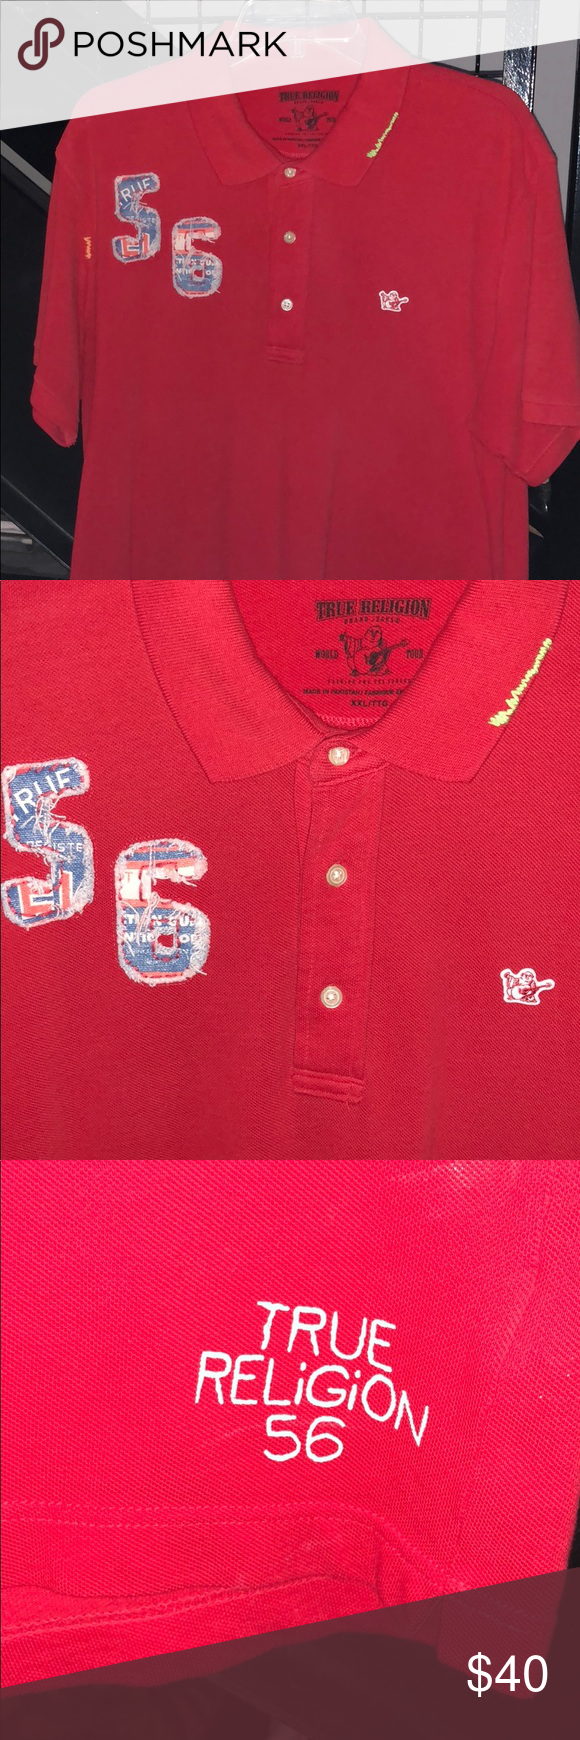 True Religion Polo Shirt 56 My Posh Picks Pinterest Shirts